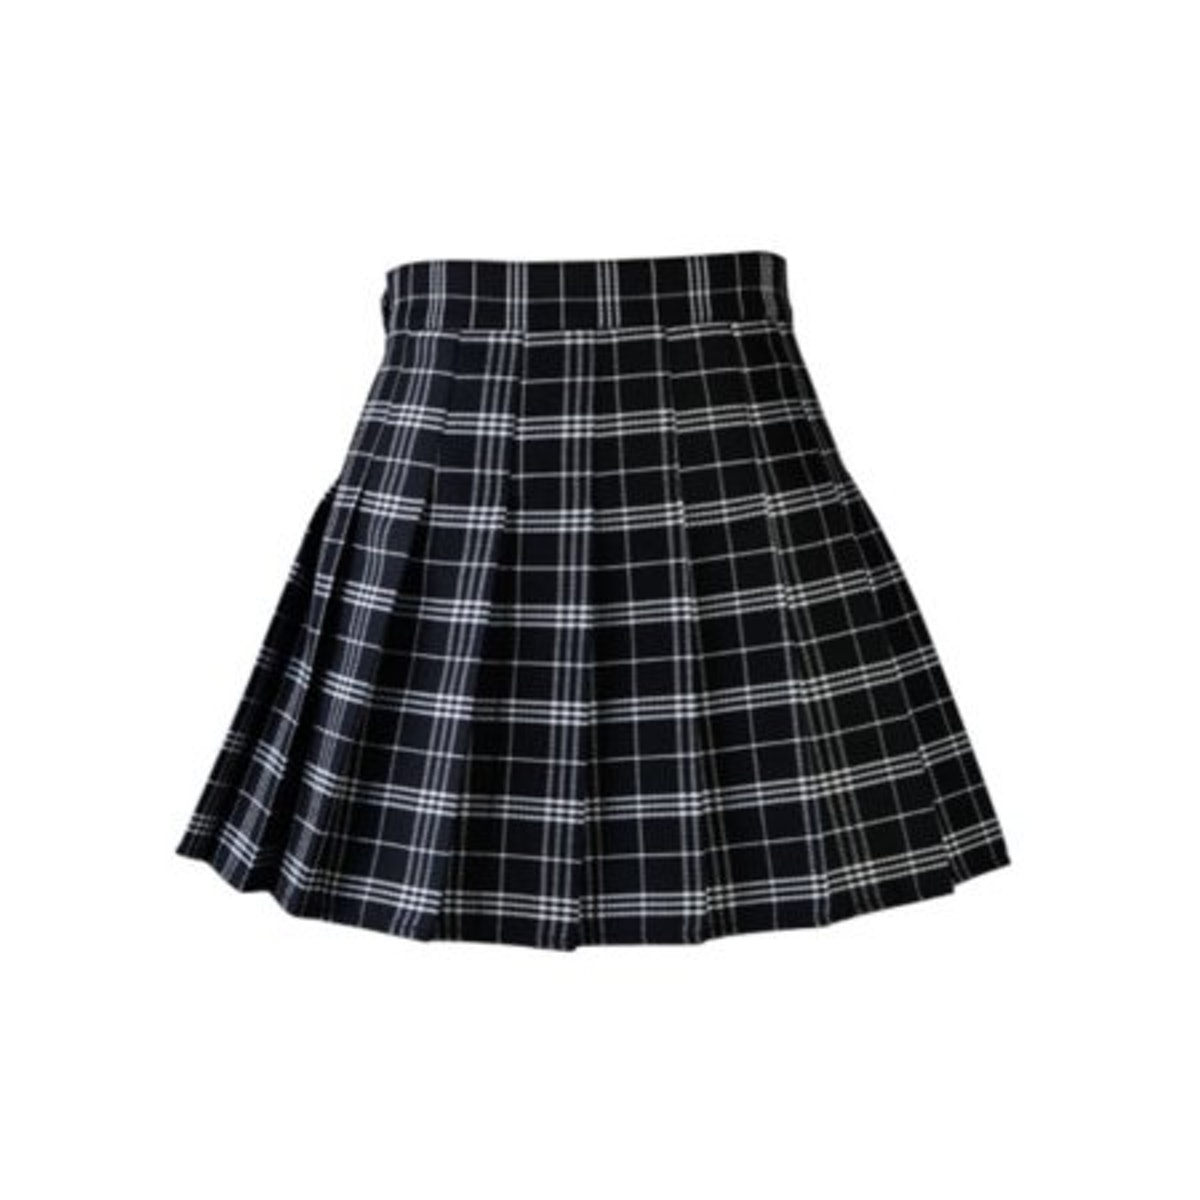 Casual Plaid Skirt High Waist Pleated Skirt A-line School Skirt Uniform With Inner Shorts